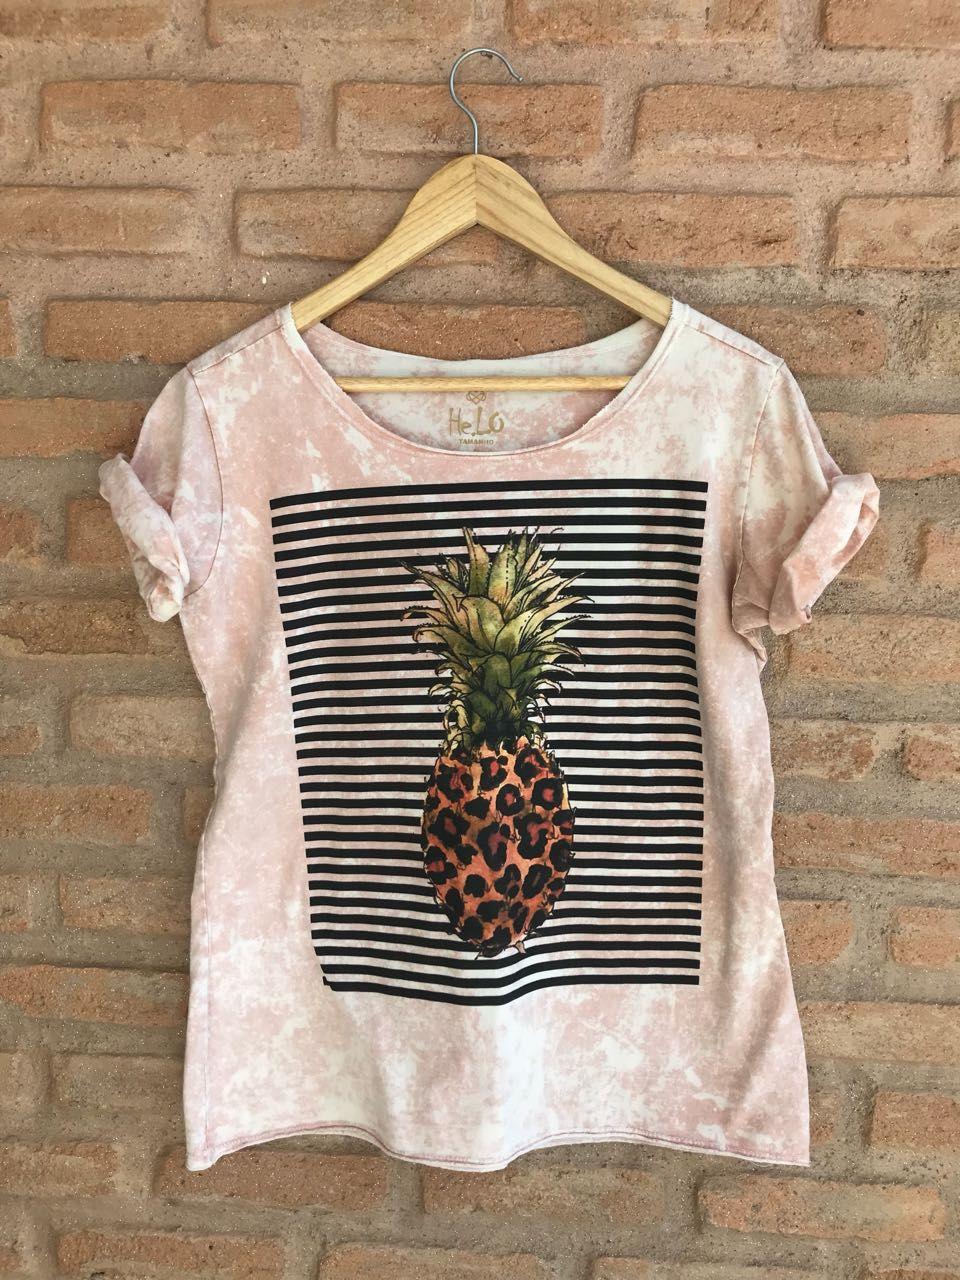 48fe9c477a T-shirt feminina descolada estampa de abacaxi exclusiva. R$59,90. Compre  pelo Mercado Livre.